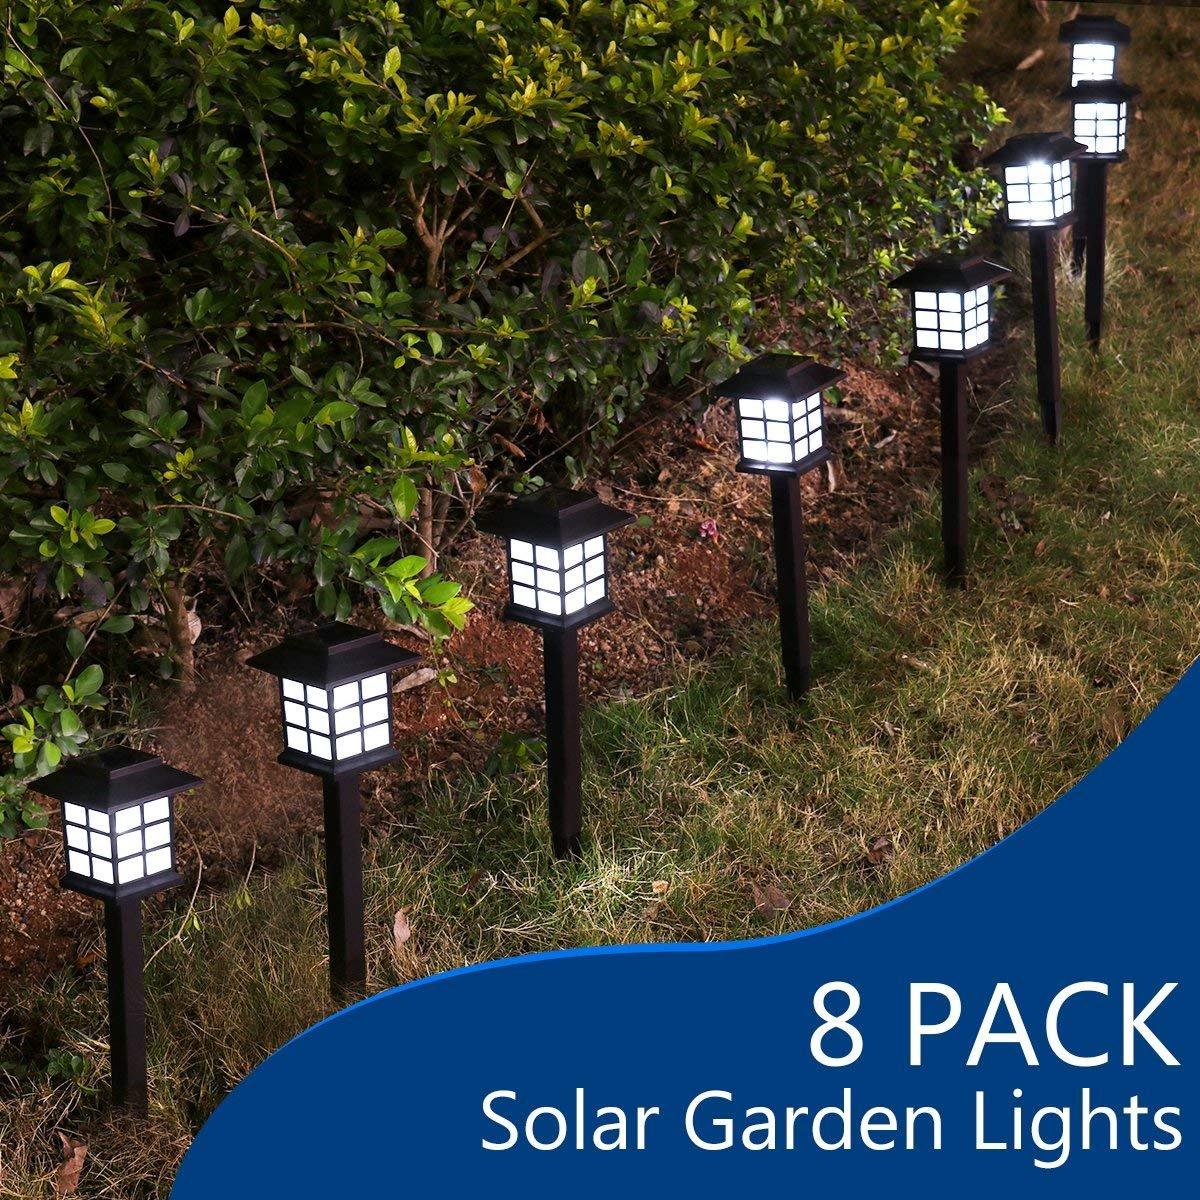 YUNLIGHTS 8pcs Garden Solar Stake Lights Outdoor Solar Pathway ...